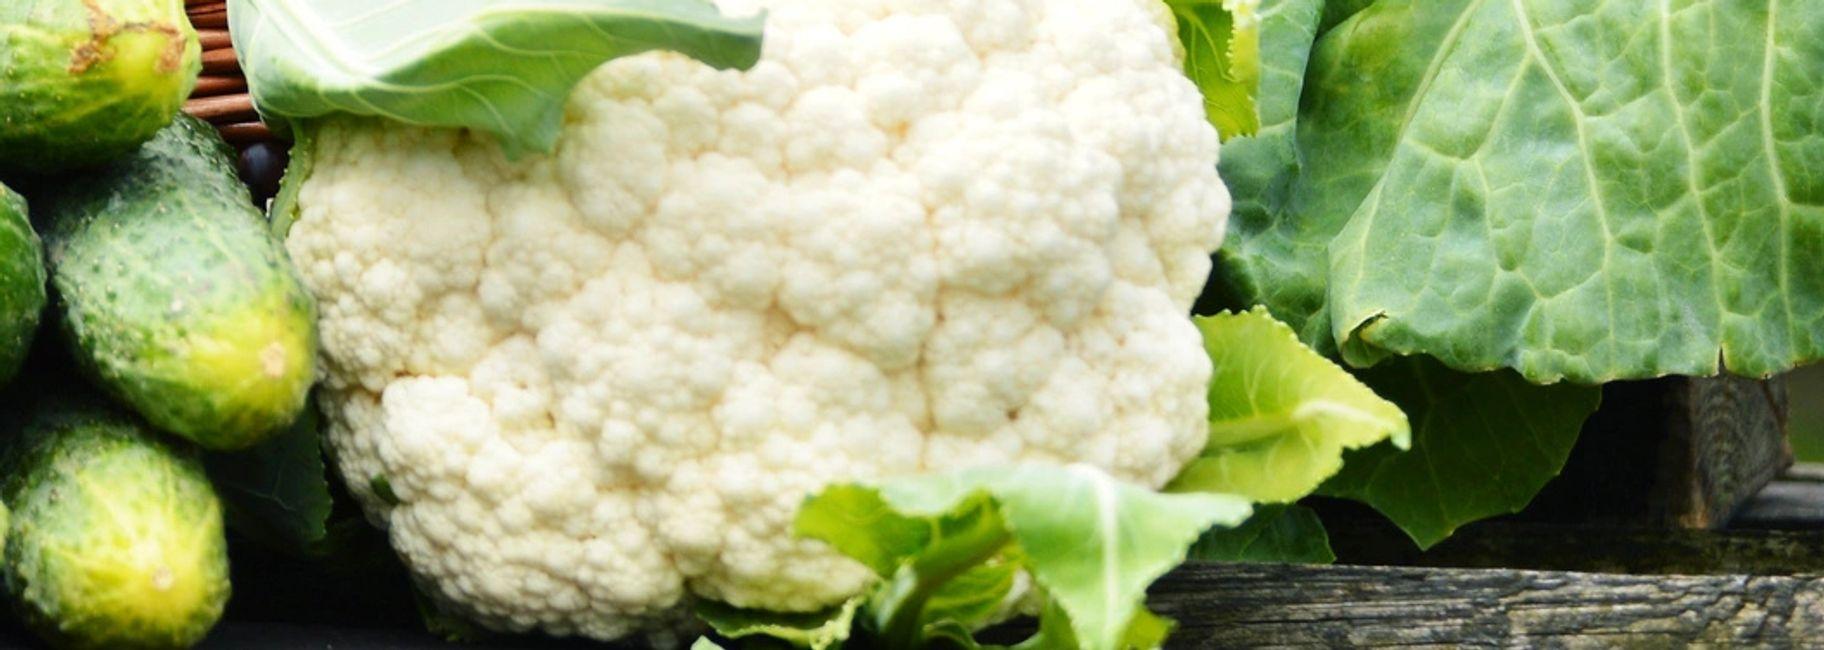 Roasted Garlic, Cauliflower & Wasabi Mash Potatoes